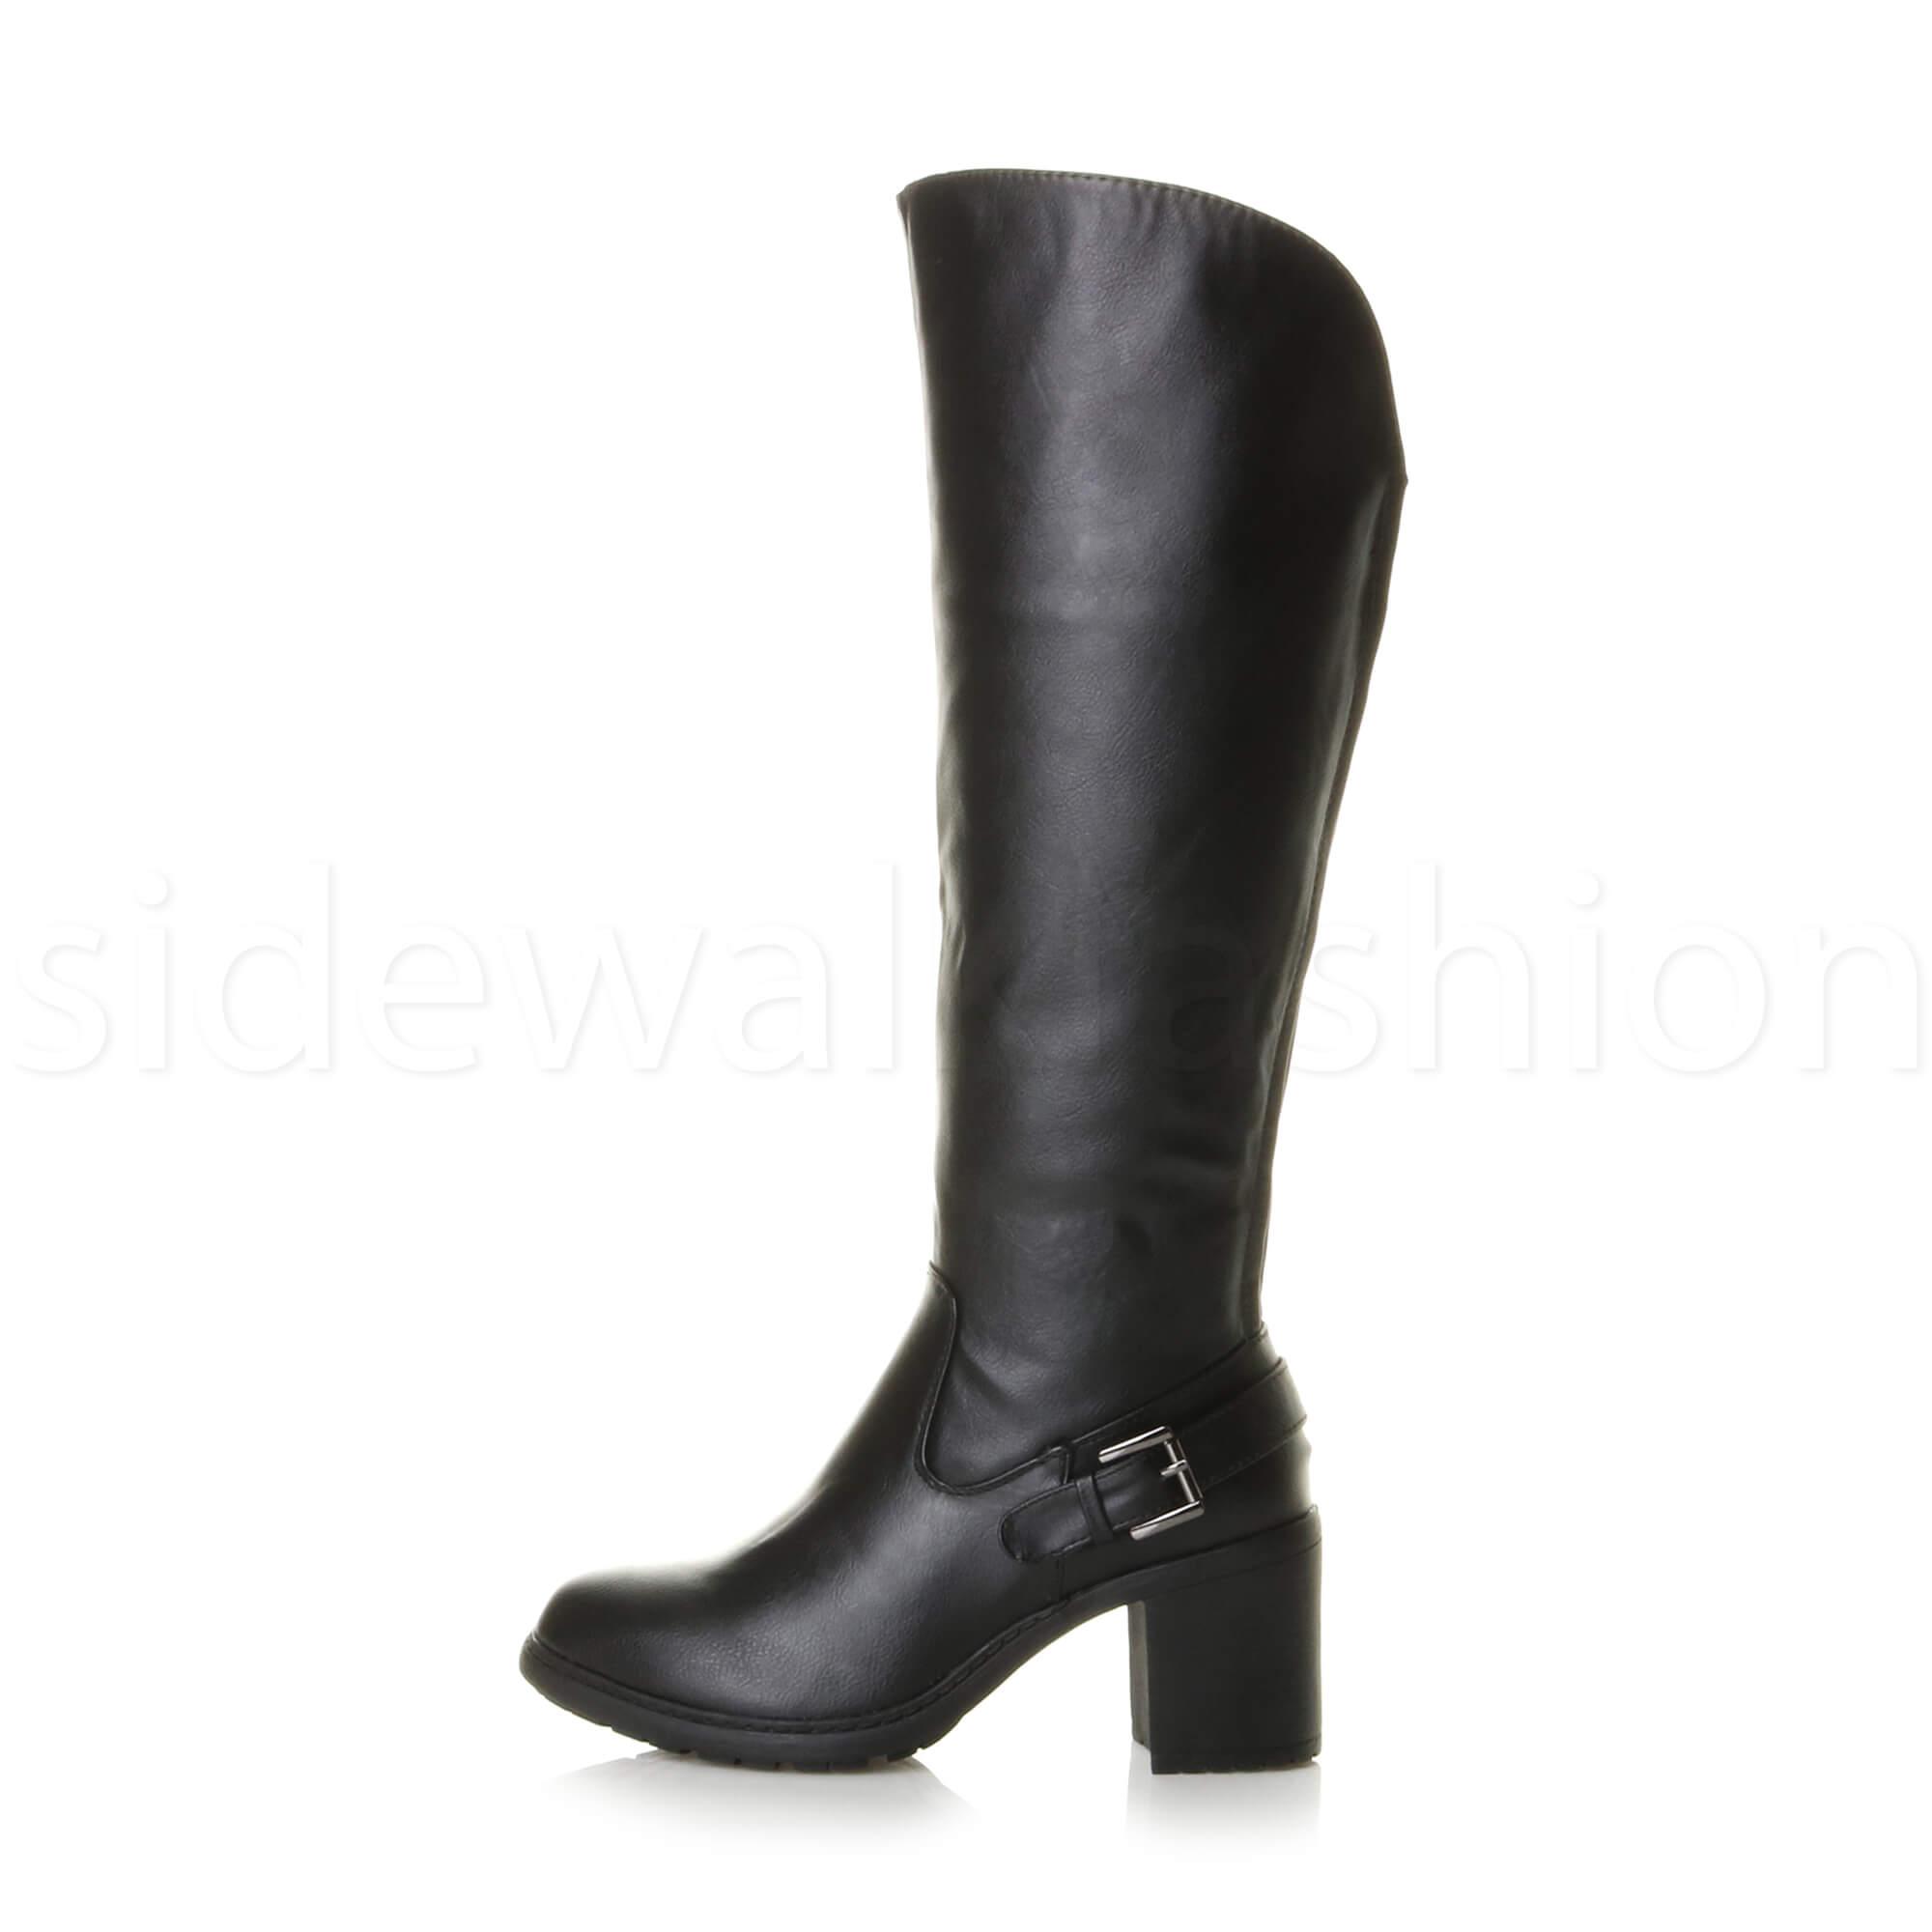 4563be011c Womens ladies block high heel wide calf zip stretch biker riding ...